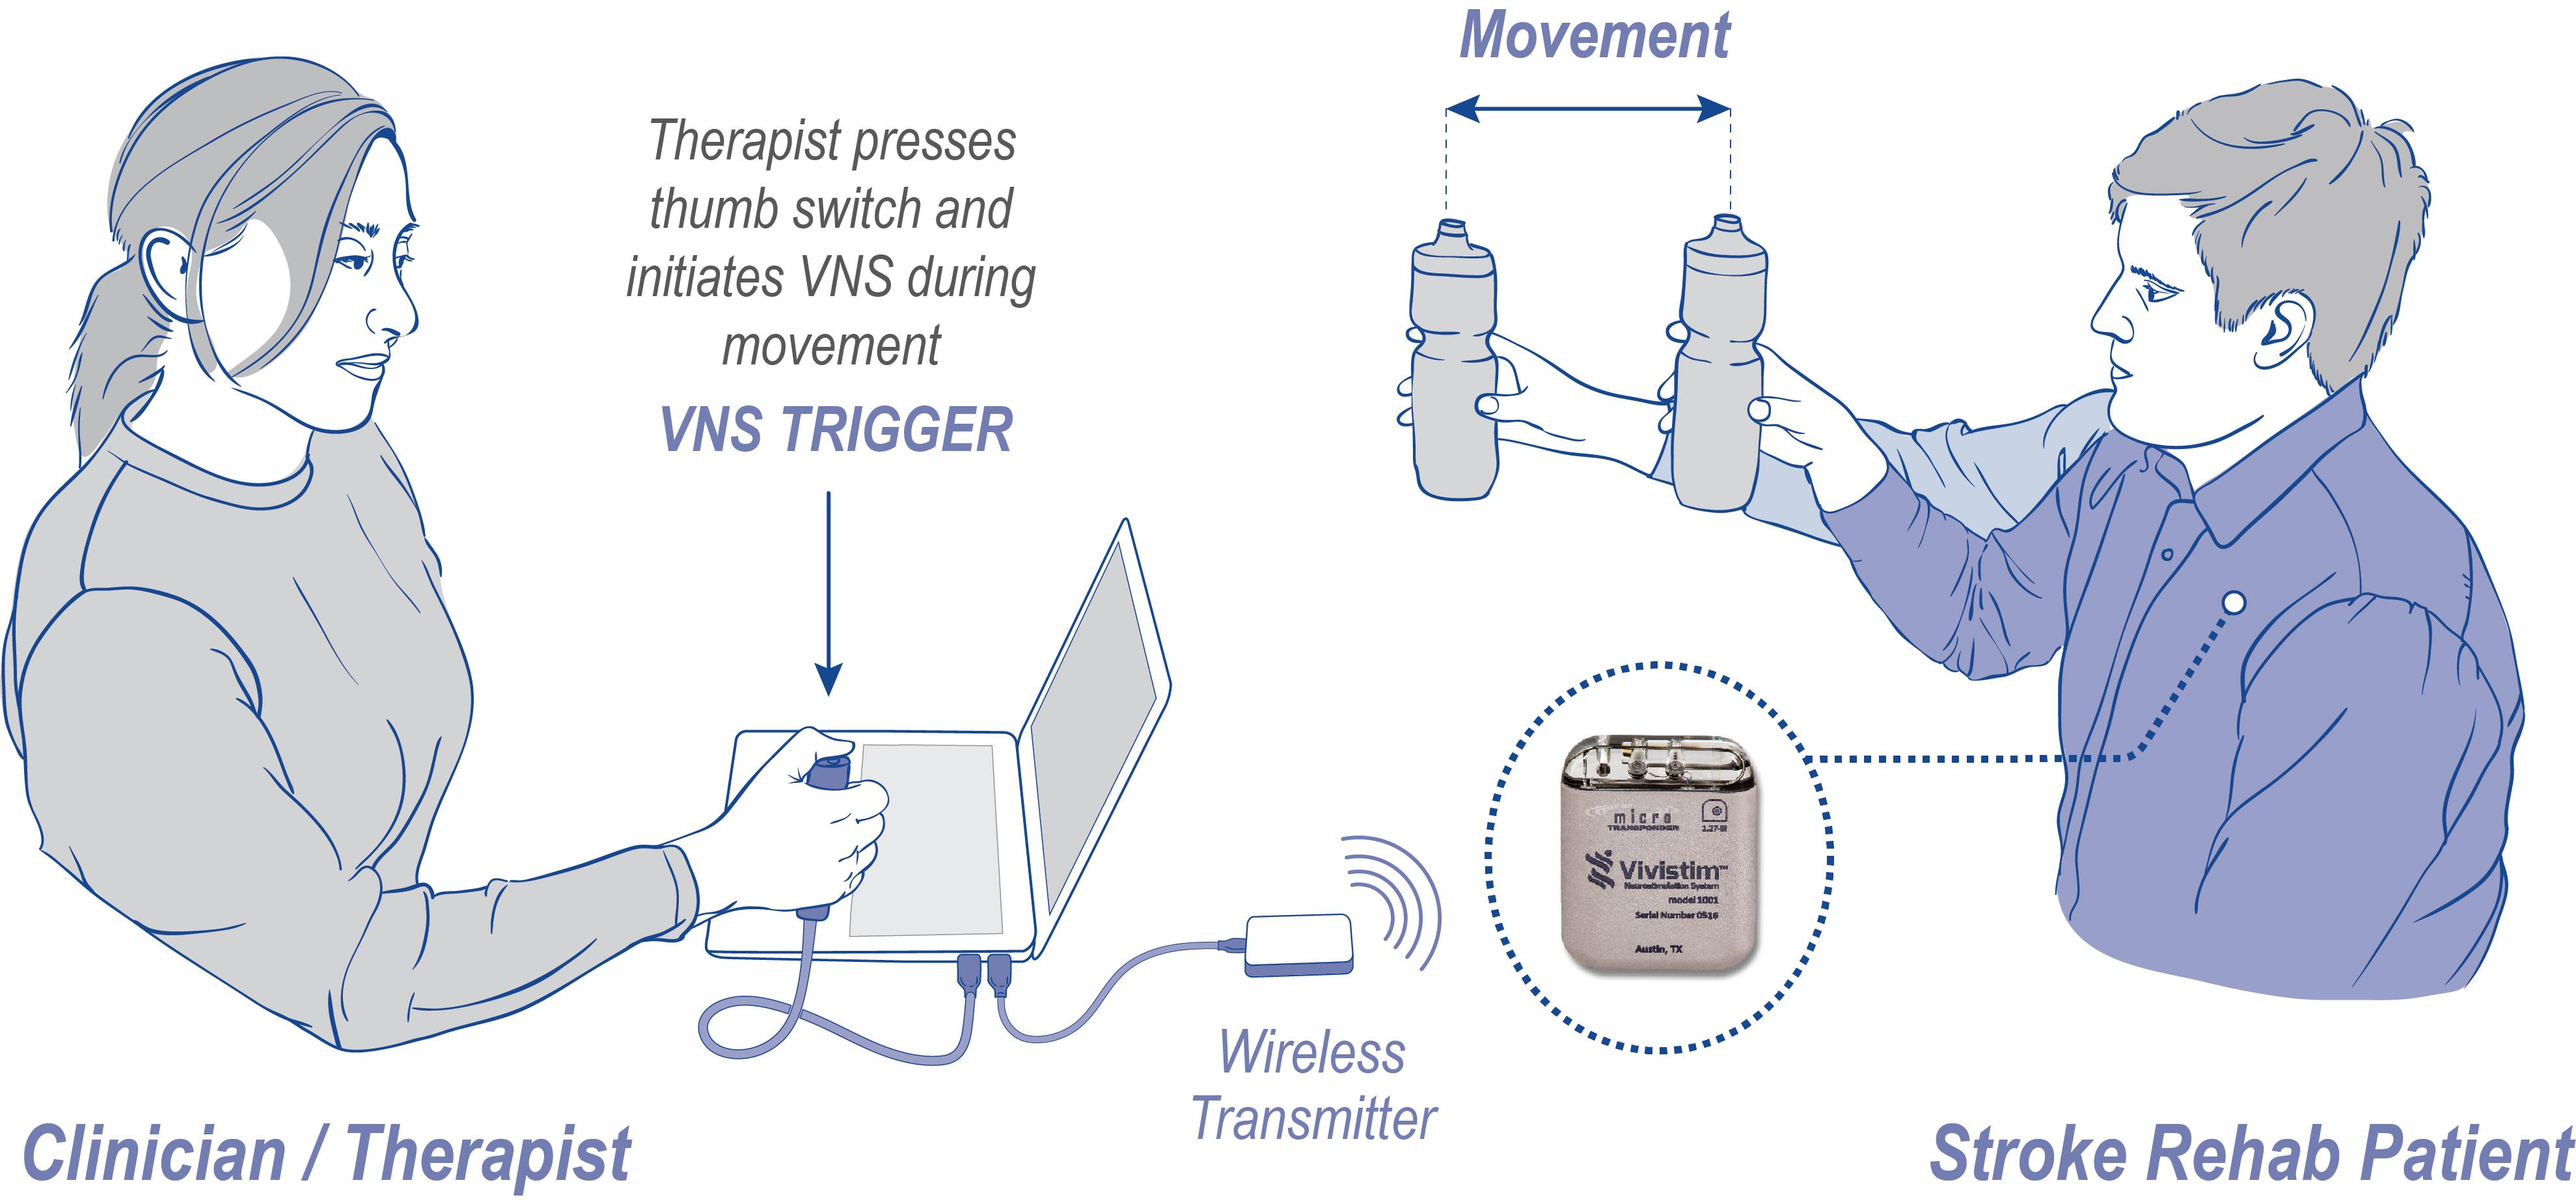 Microtransponder tinnitus trials 2013 tickets